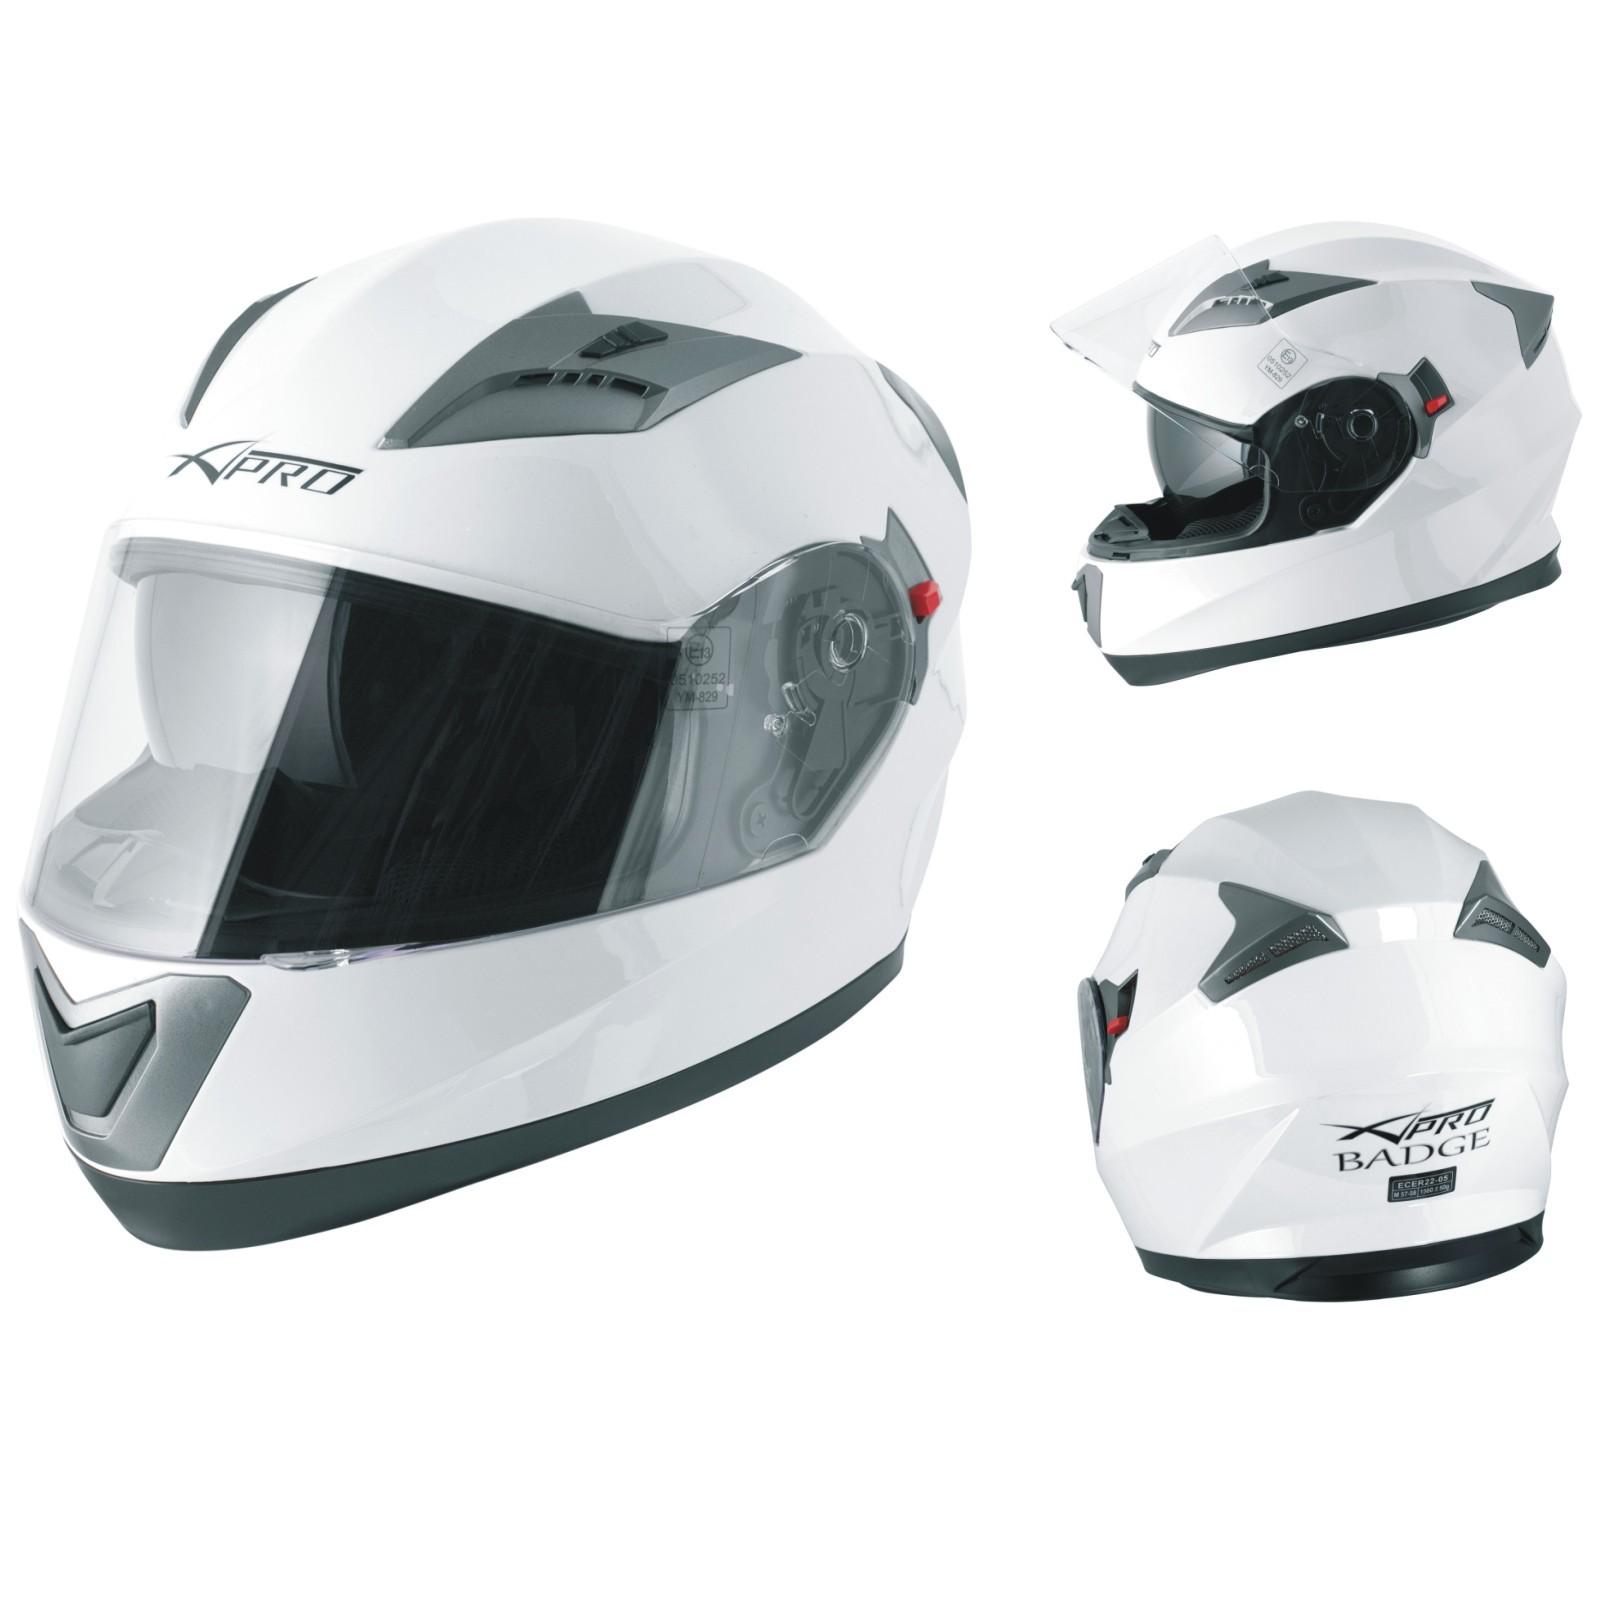 Casco Integrale Moto Scooter Visierino Parasole Touring Bianco